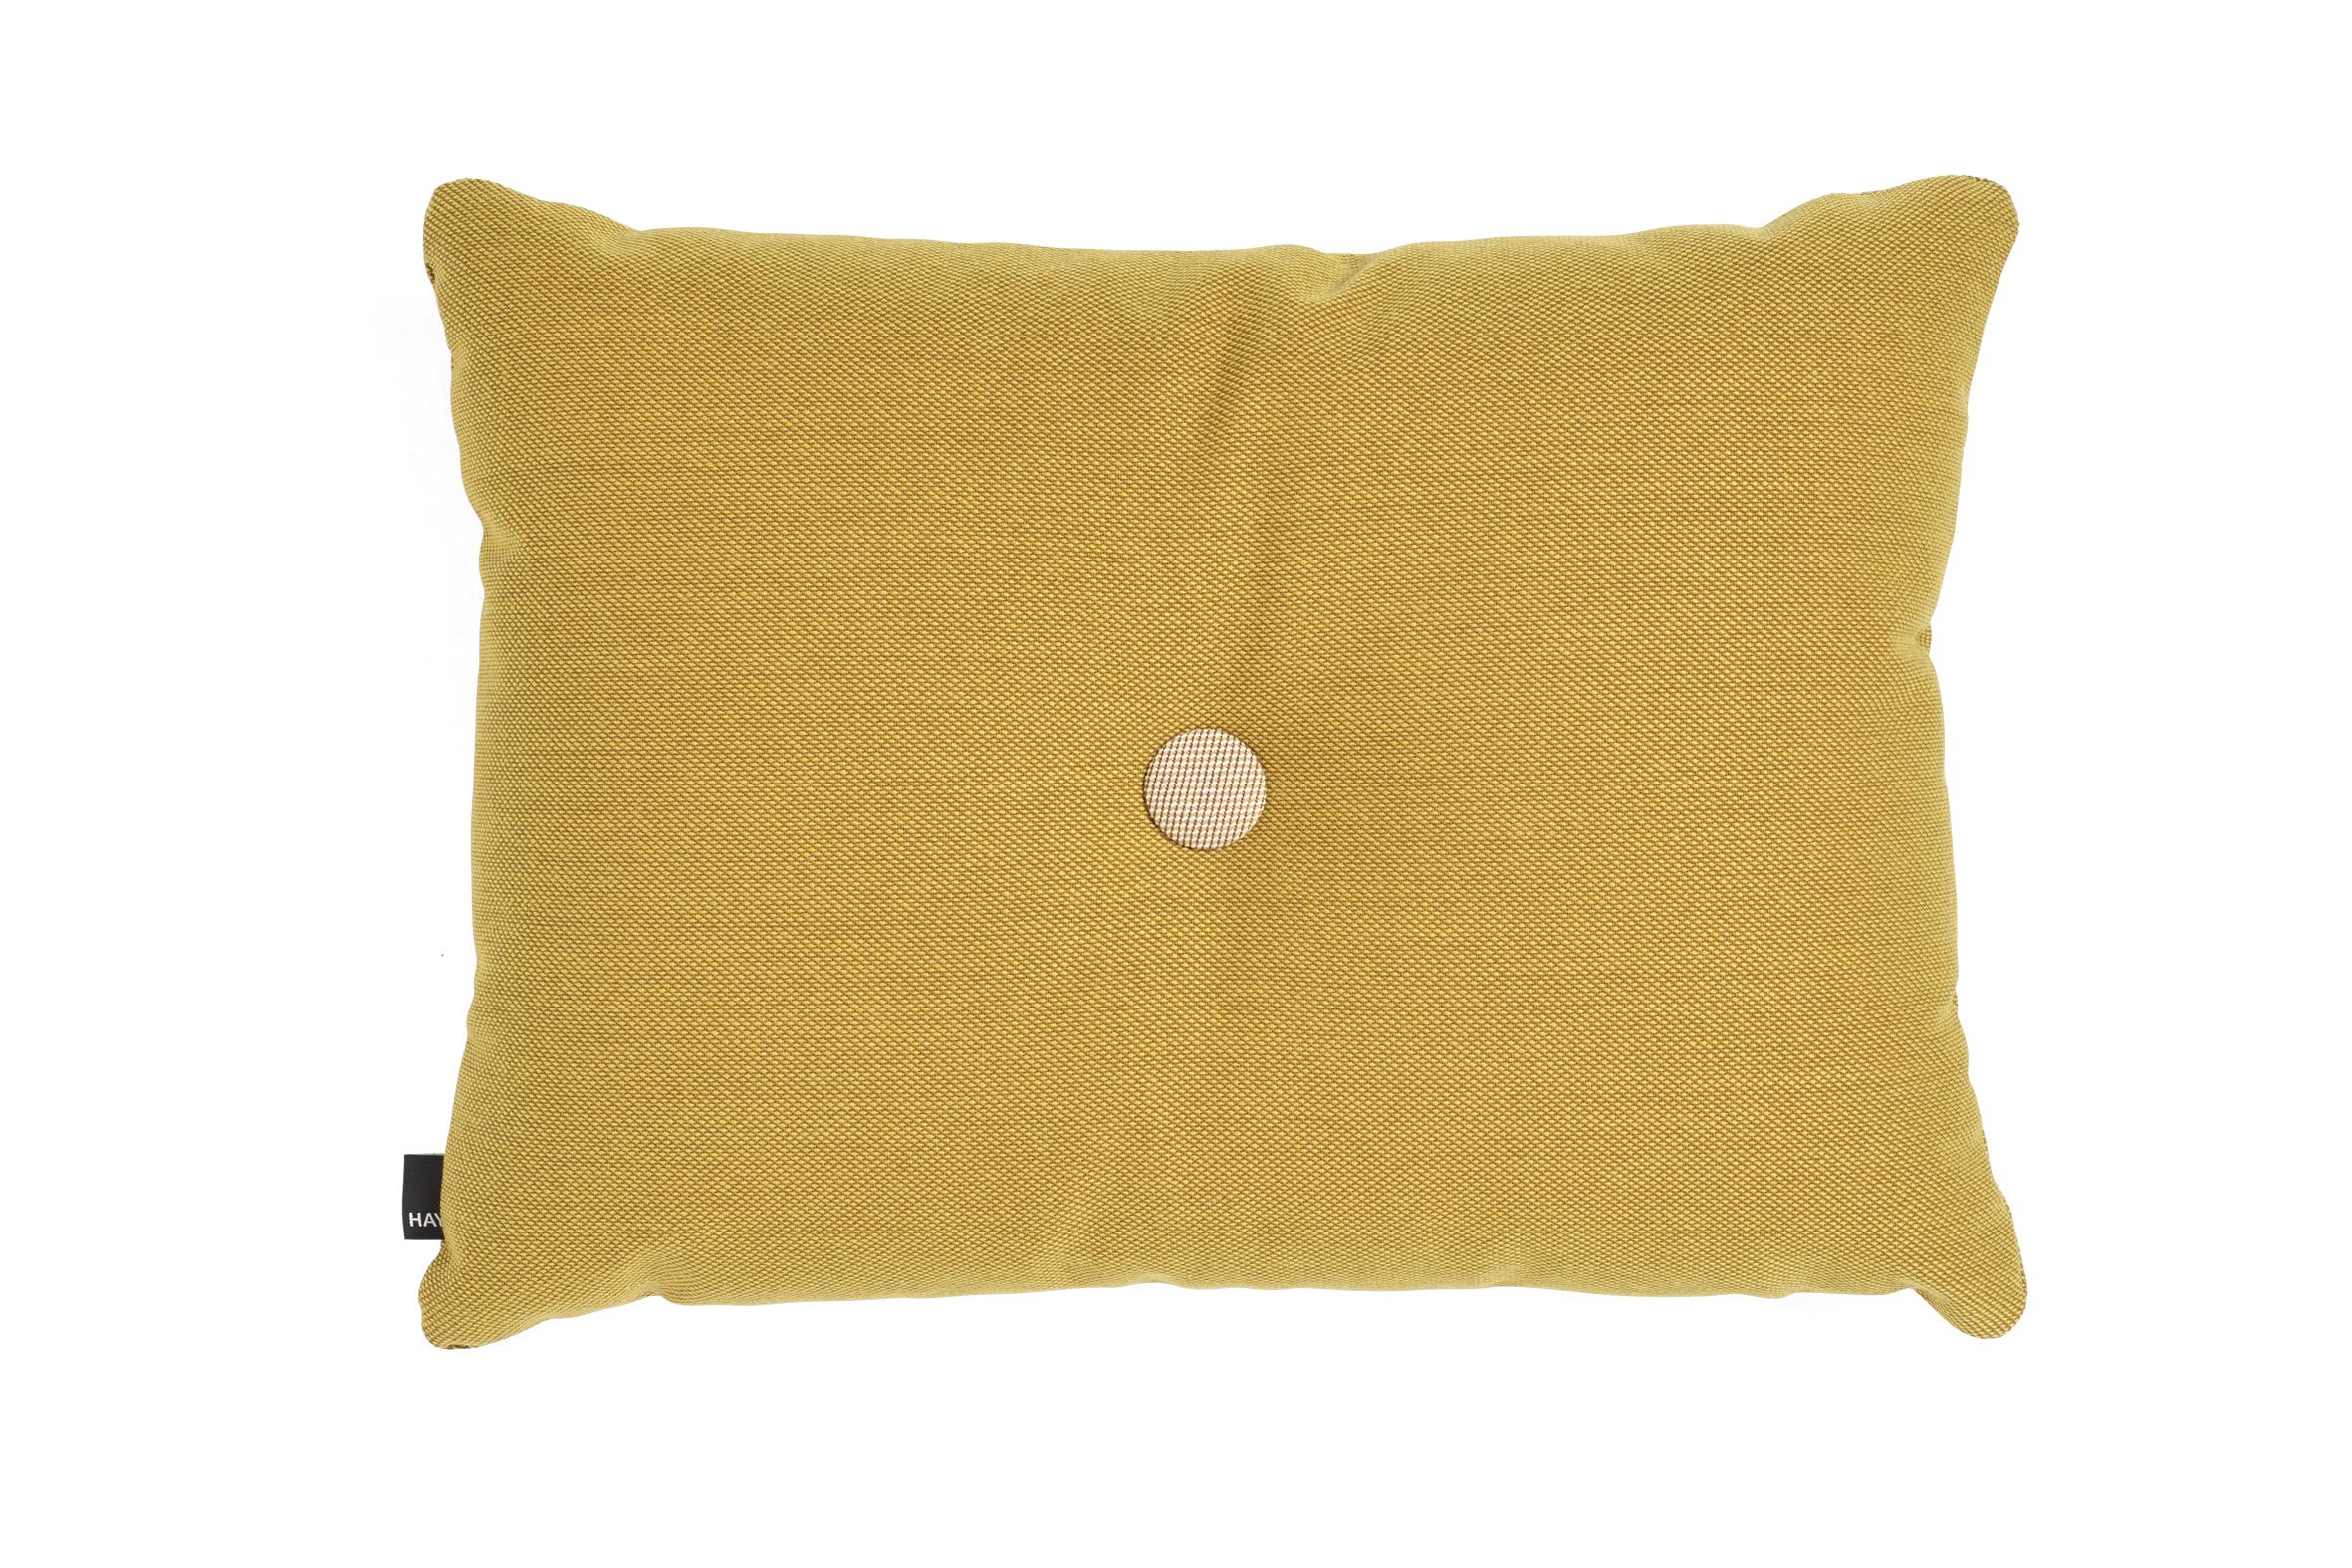 Dot cushion ST 1 dot golden yellow